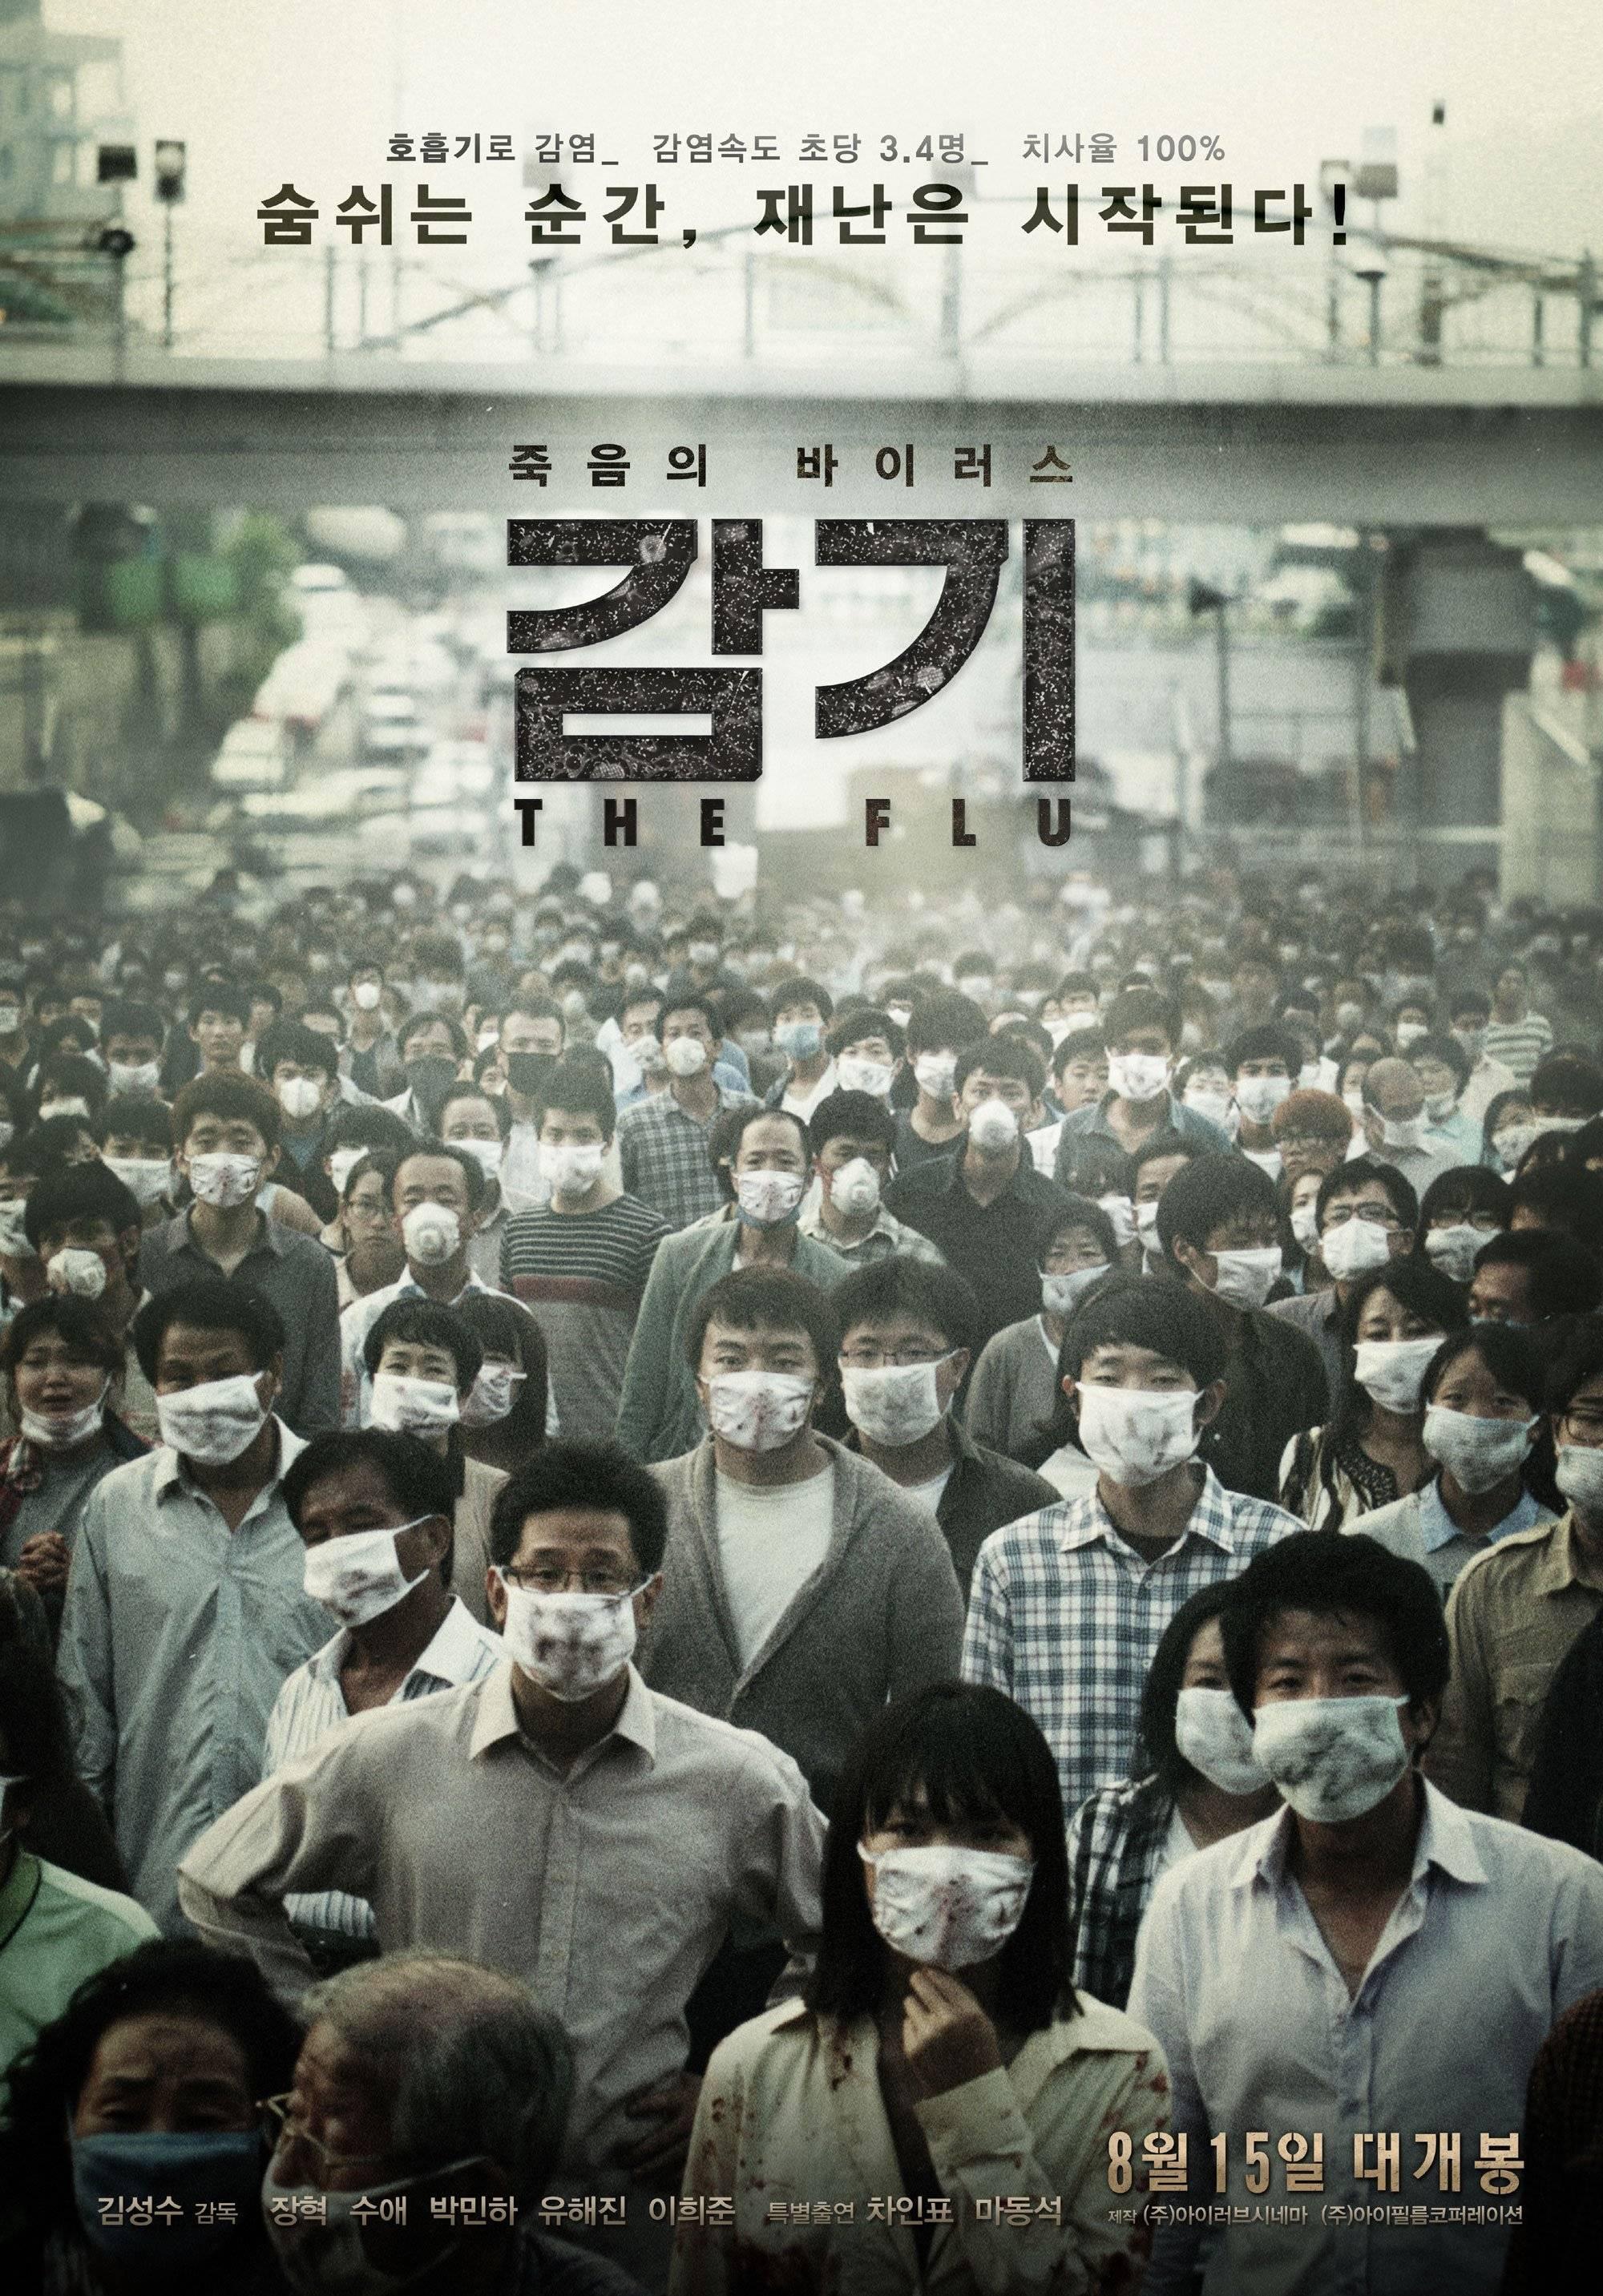 The Flu Ê°ê¸° Movie Picture Gallery Hancinema The Korean Movie And Drama Database